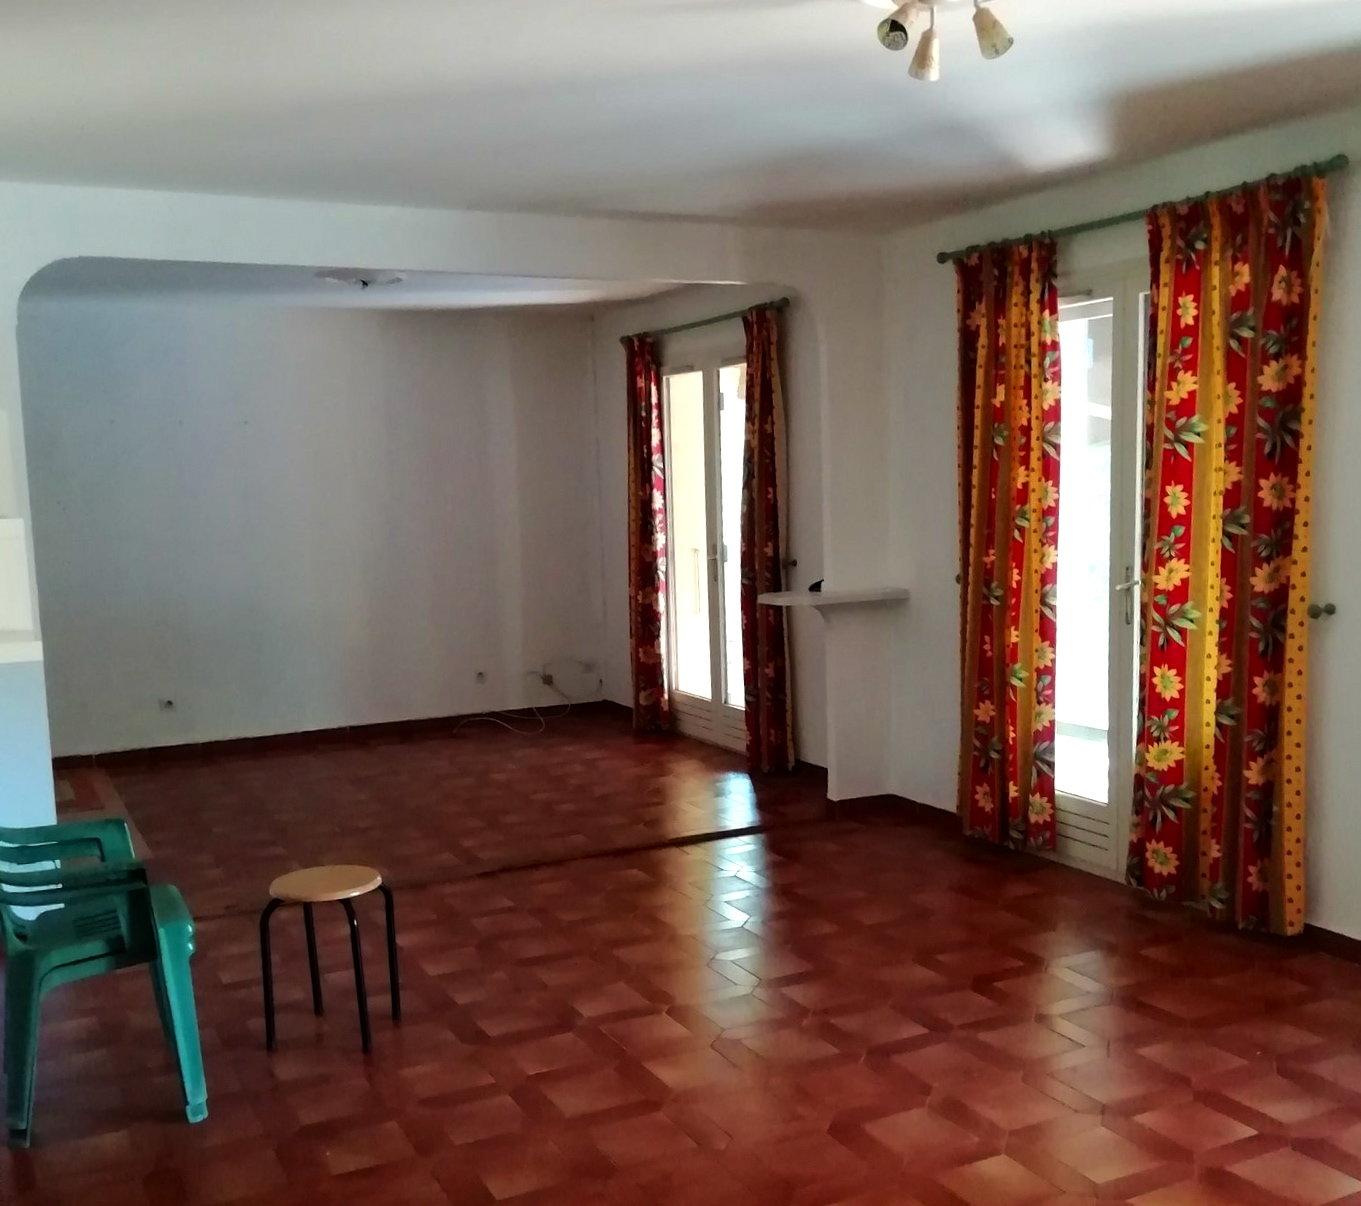 Vidauban, villa to be renovated in quiet surroundings.